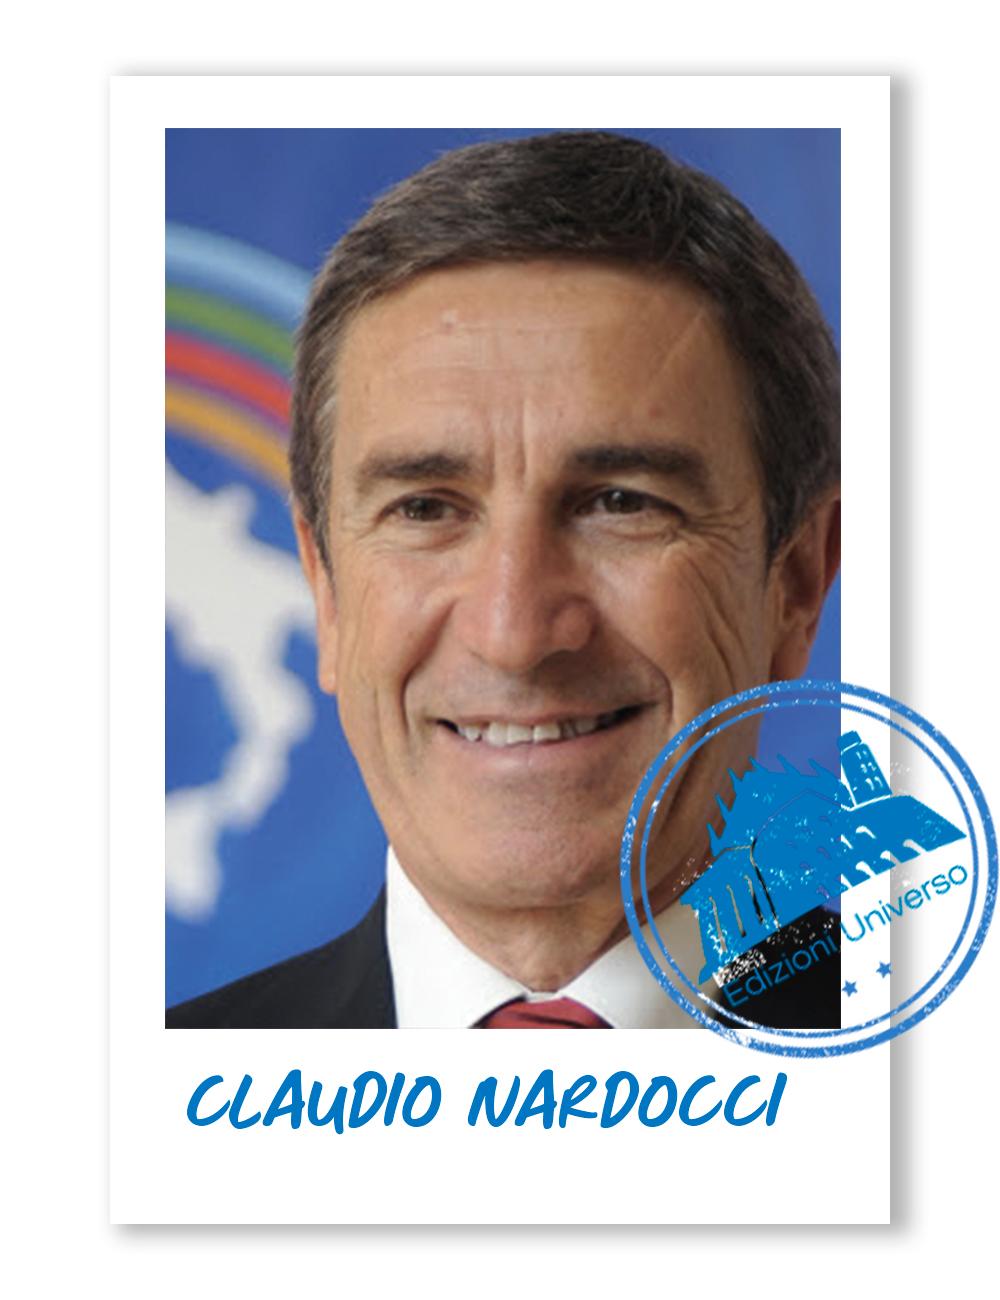 Nardocci